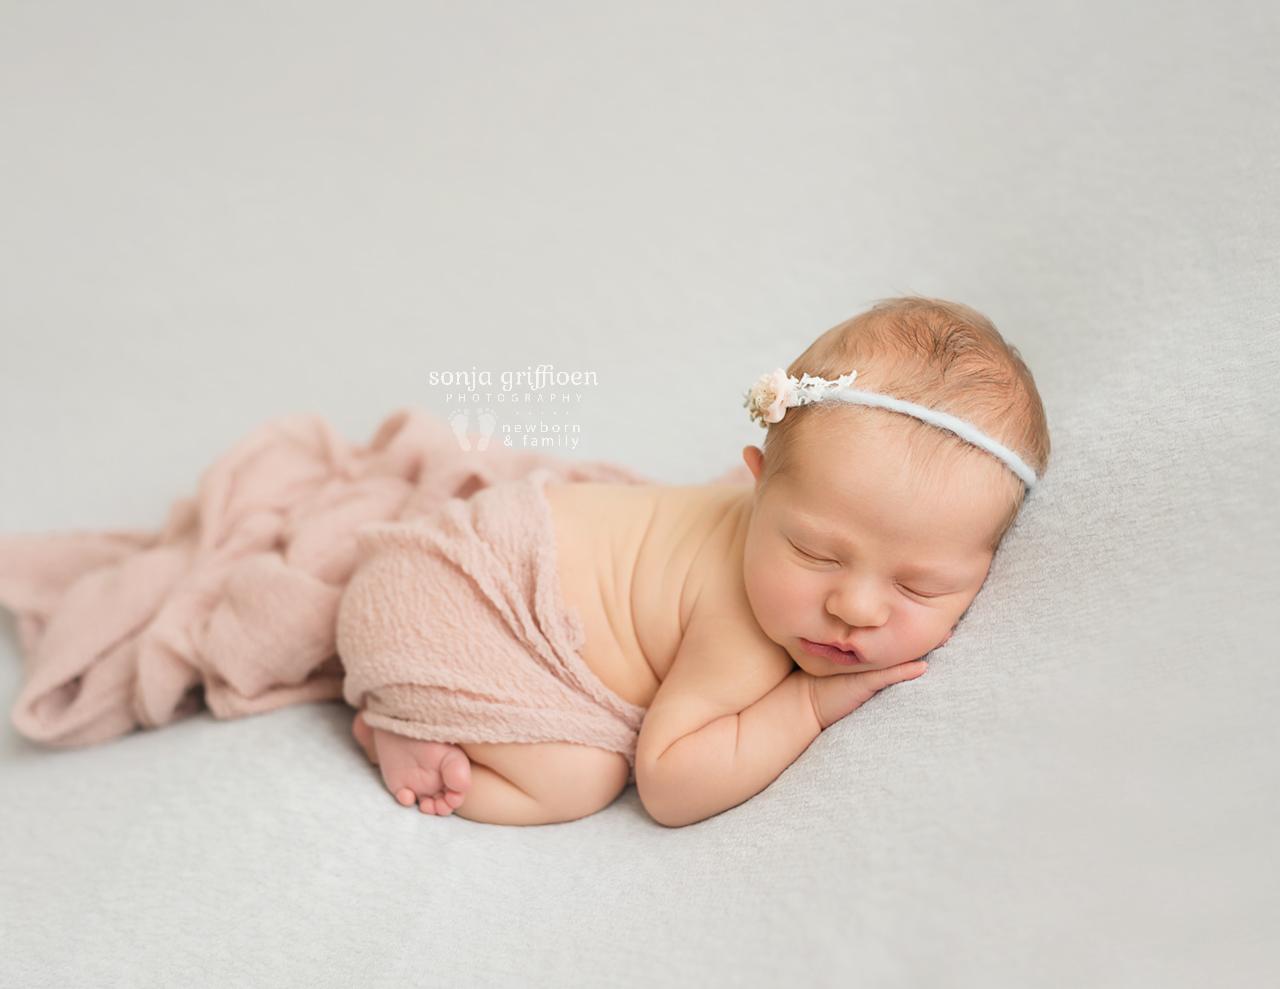 Petra-Newborn-Brisbane-Newborn-Photographer-Sonja-Griffioen-09.jpg